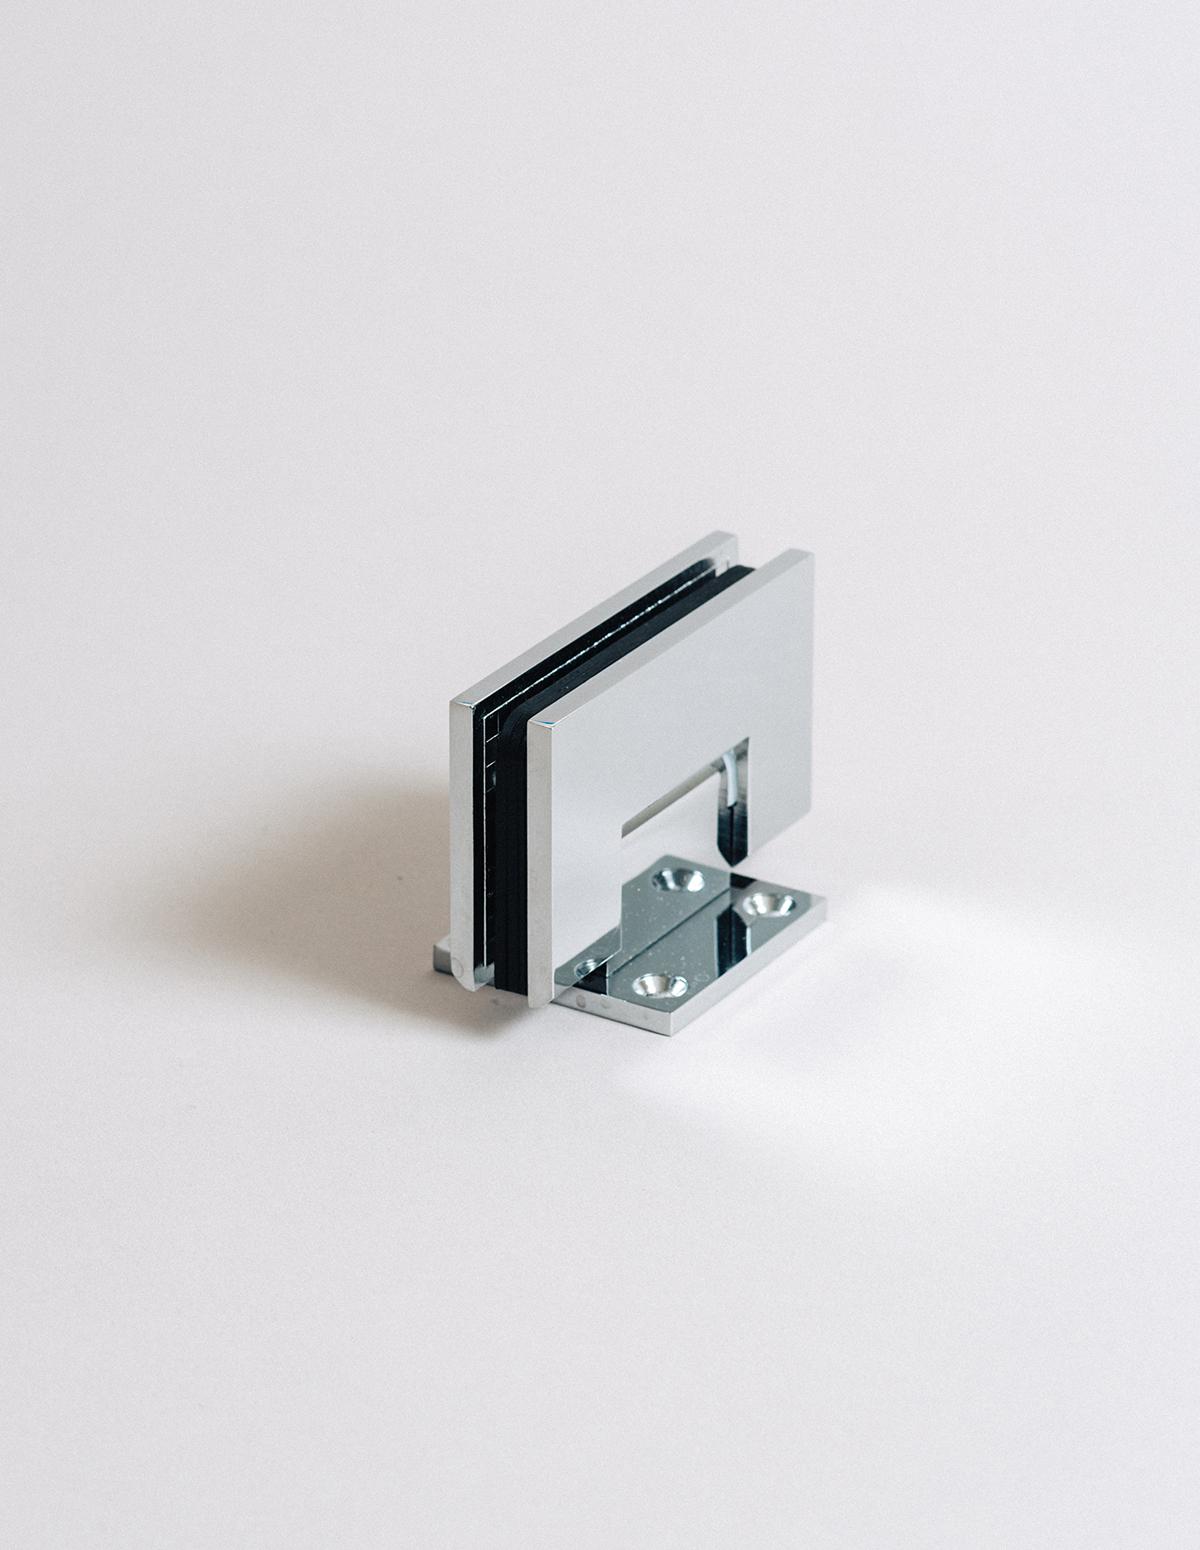 Optimum-Studios-Architectural-Glass-Metal-HardwarePage-Hinge1-042216